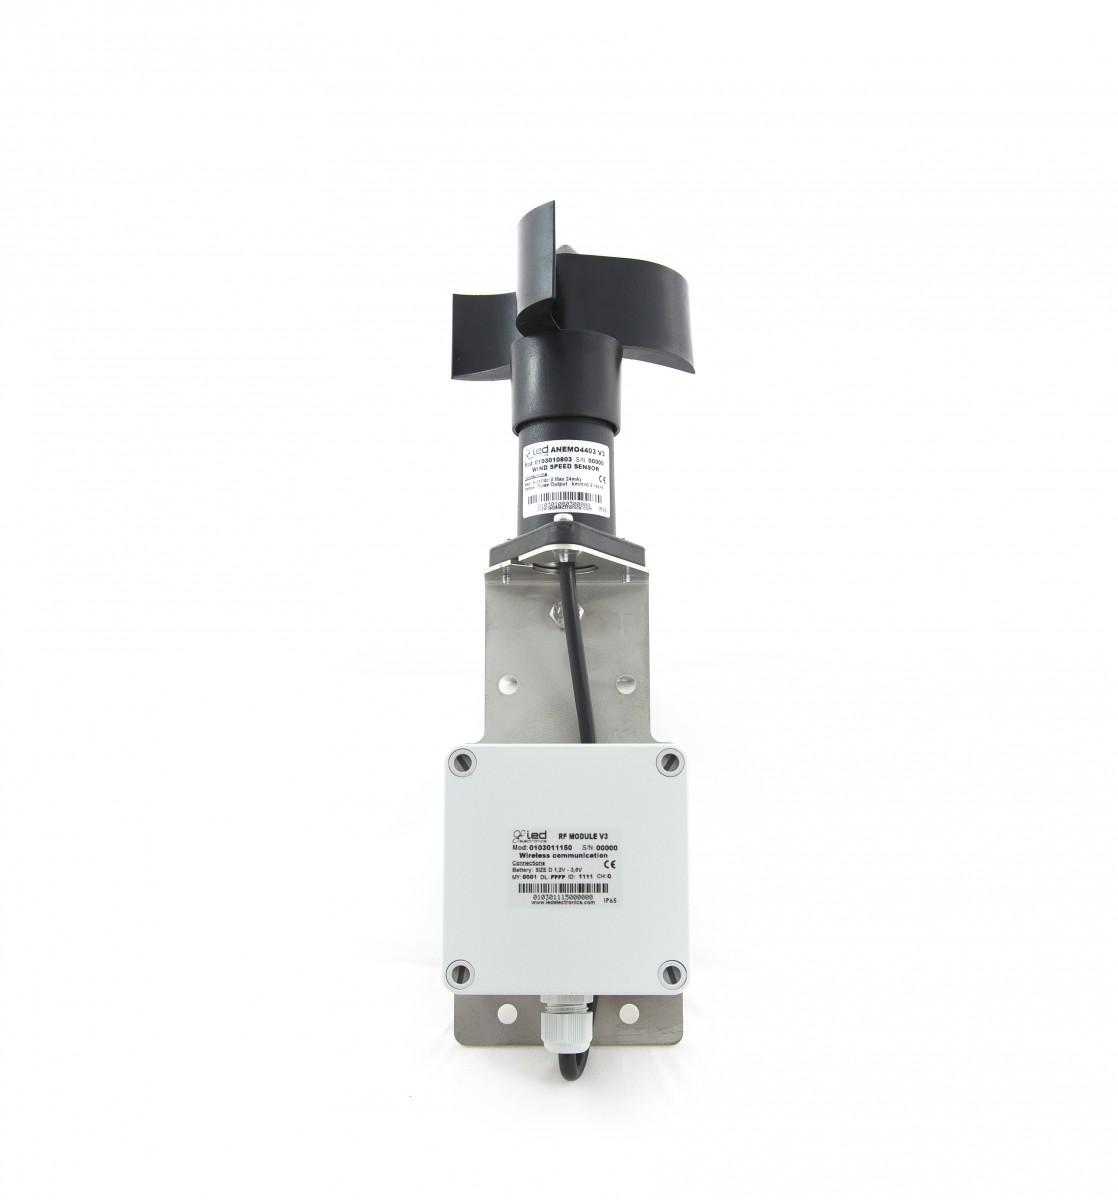 Anemo4403 VHR +RF MODULE